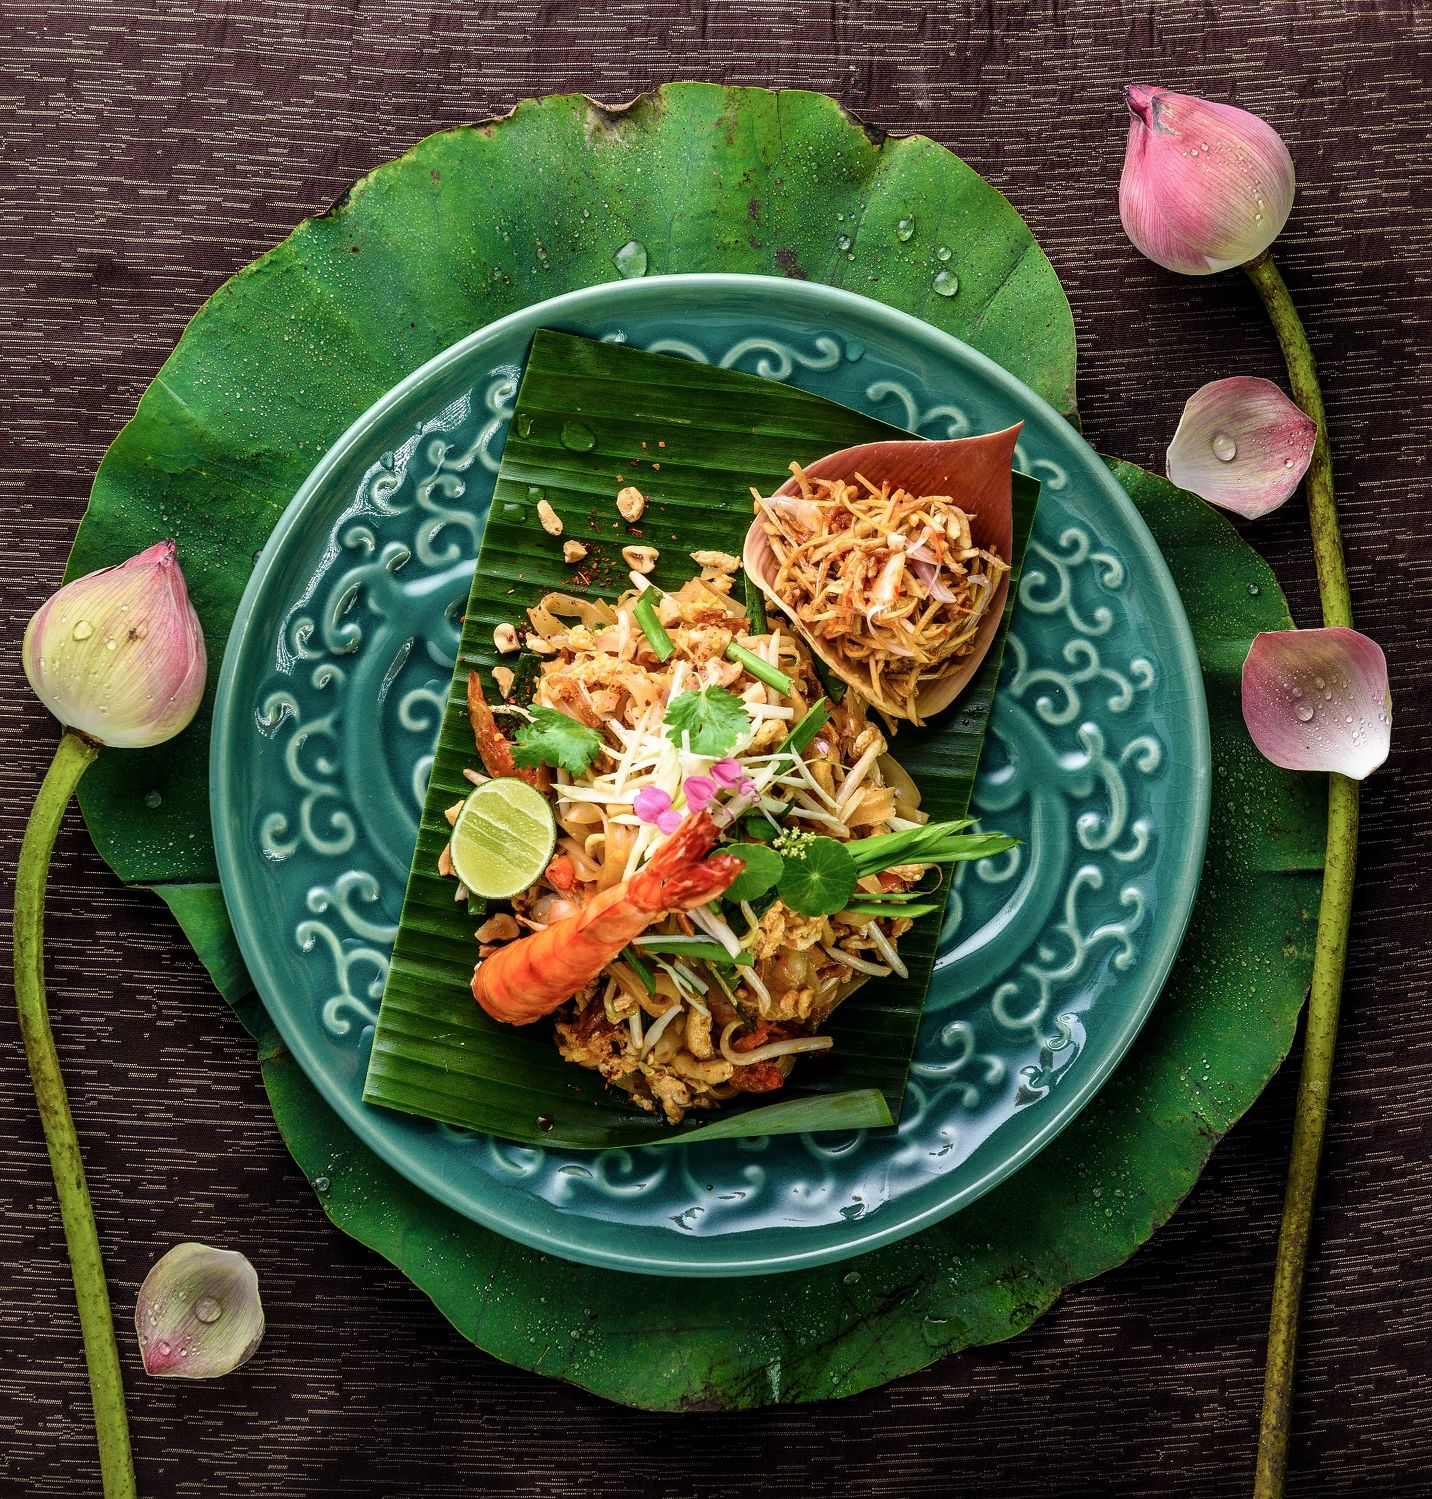 Saffron Food - THE EDGE SINGAPORE